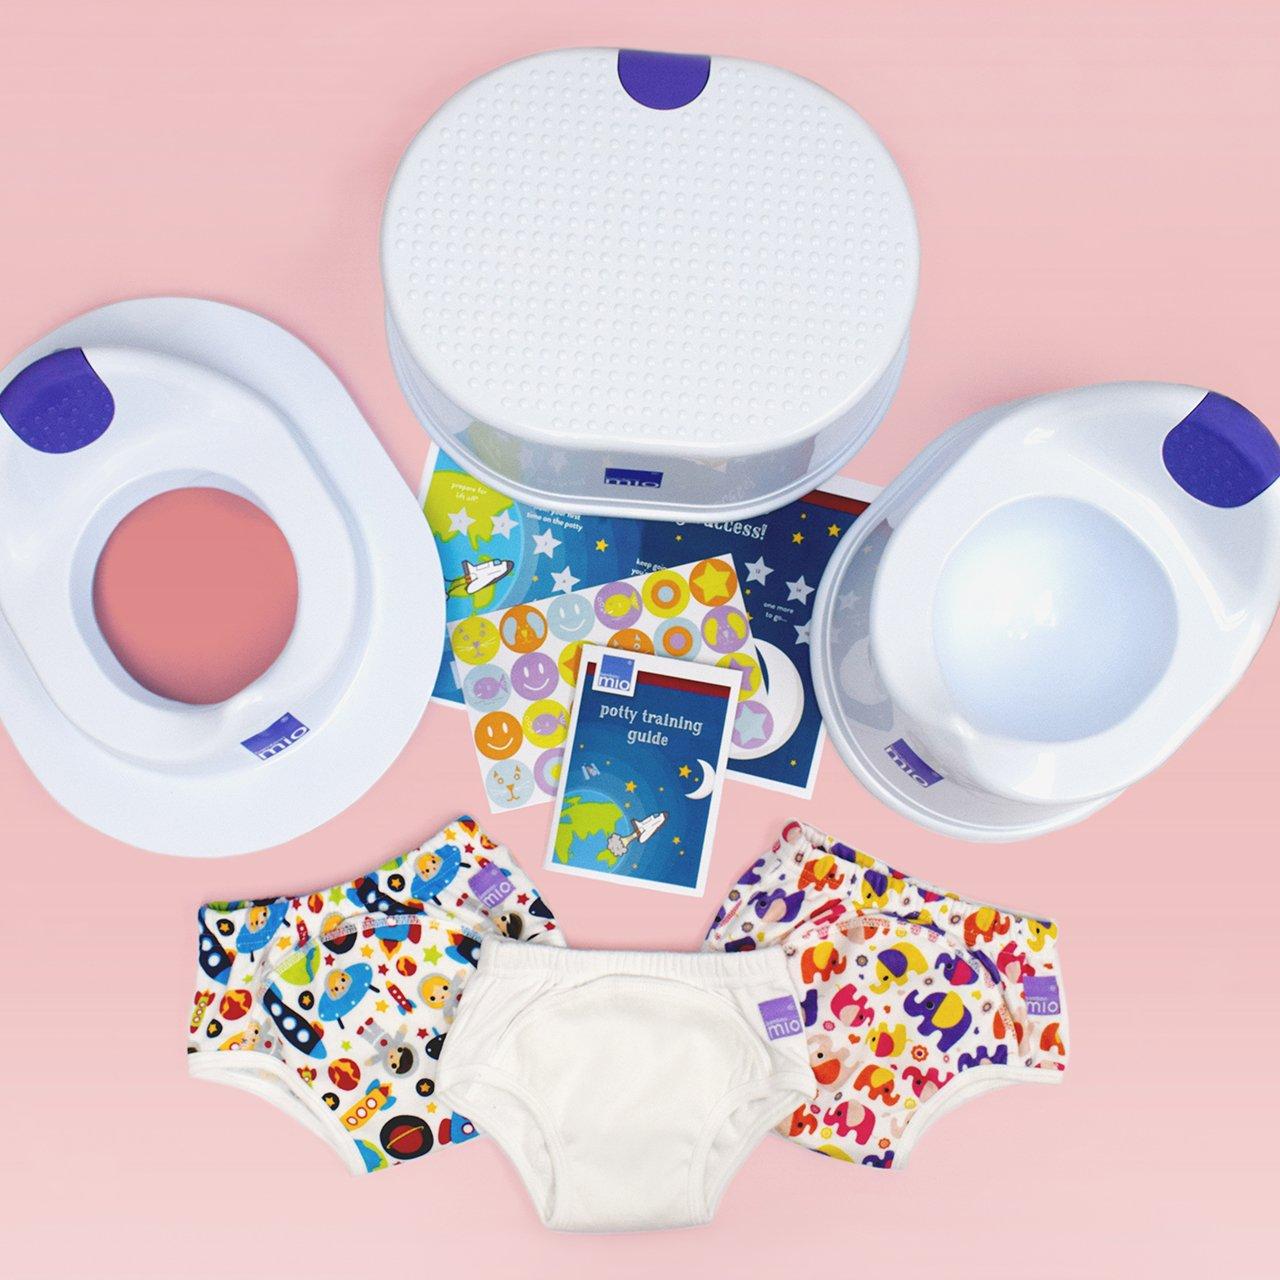 Bambino Mio Potty Training Bundle 2-3 Years Unisex